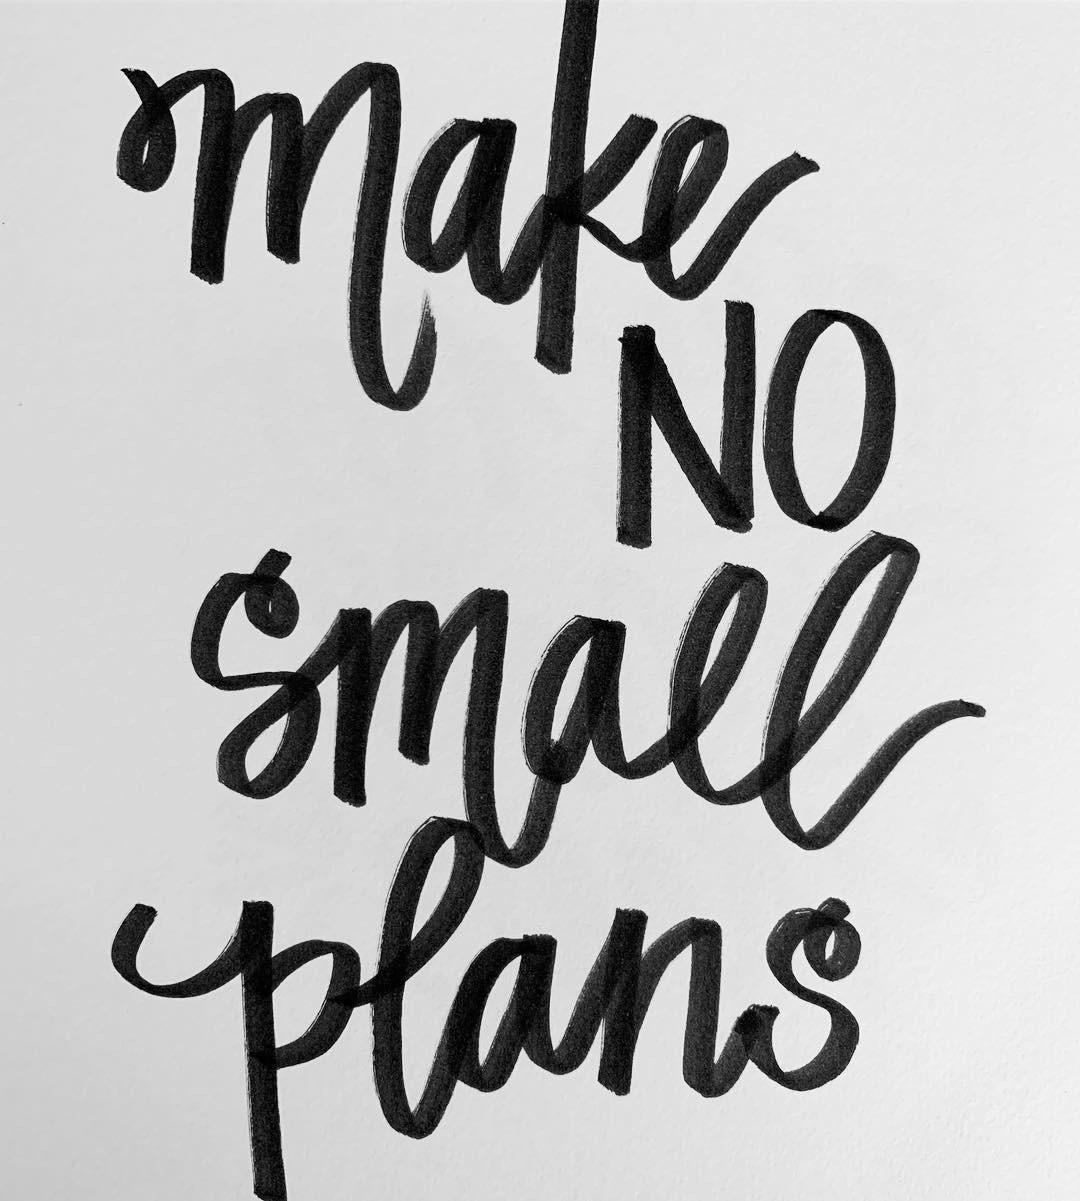 kdelap_make_no_small_plans.JPG